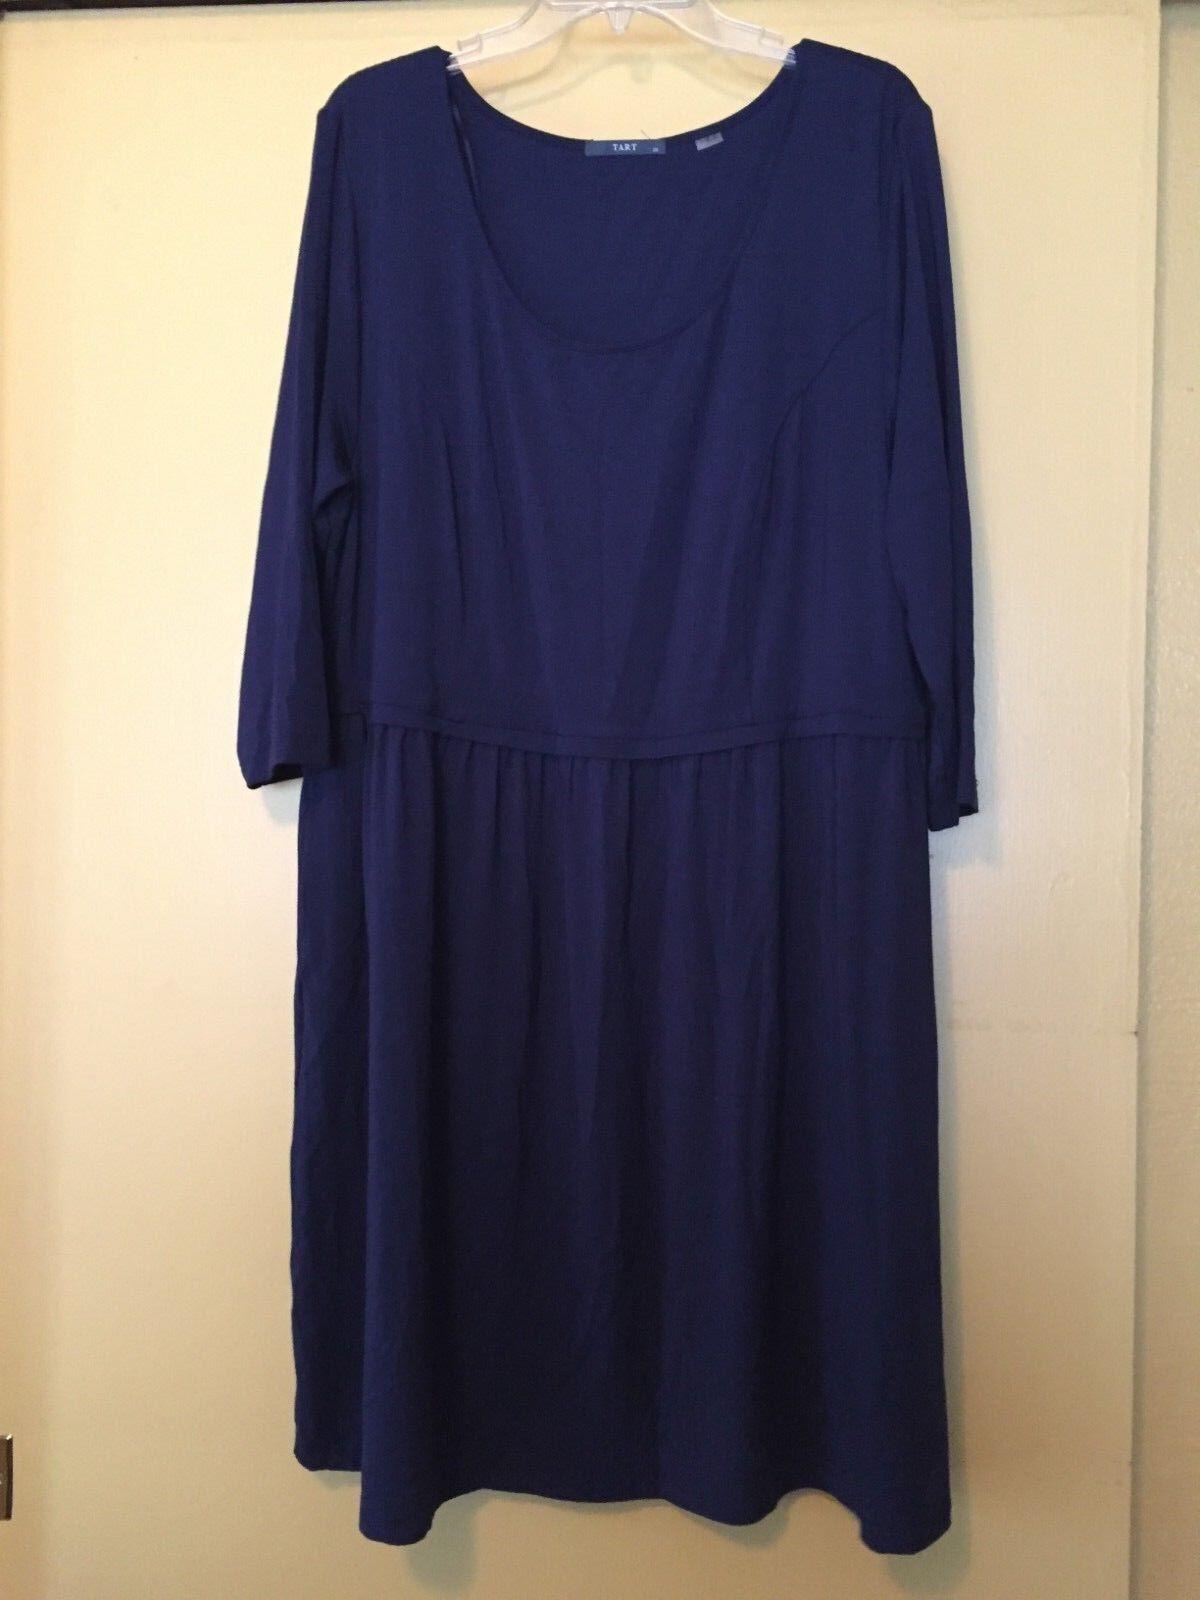 NEW Tart Short Dress, 3 4 Sleeves, Navy bluee Jersey, Size 2X Plus